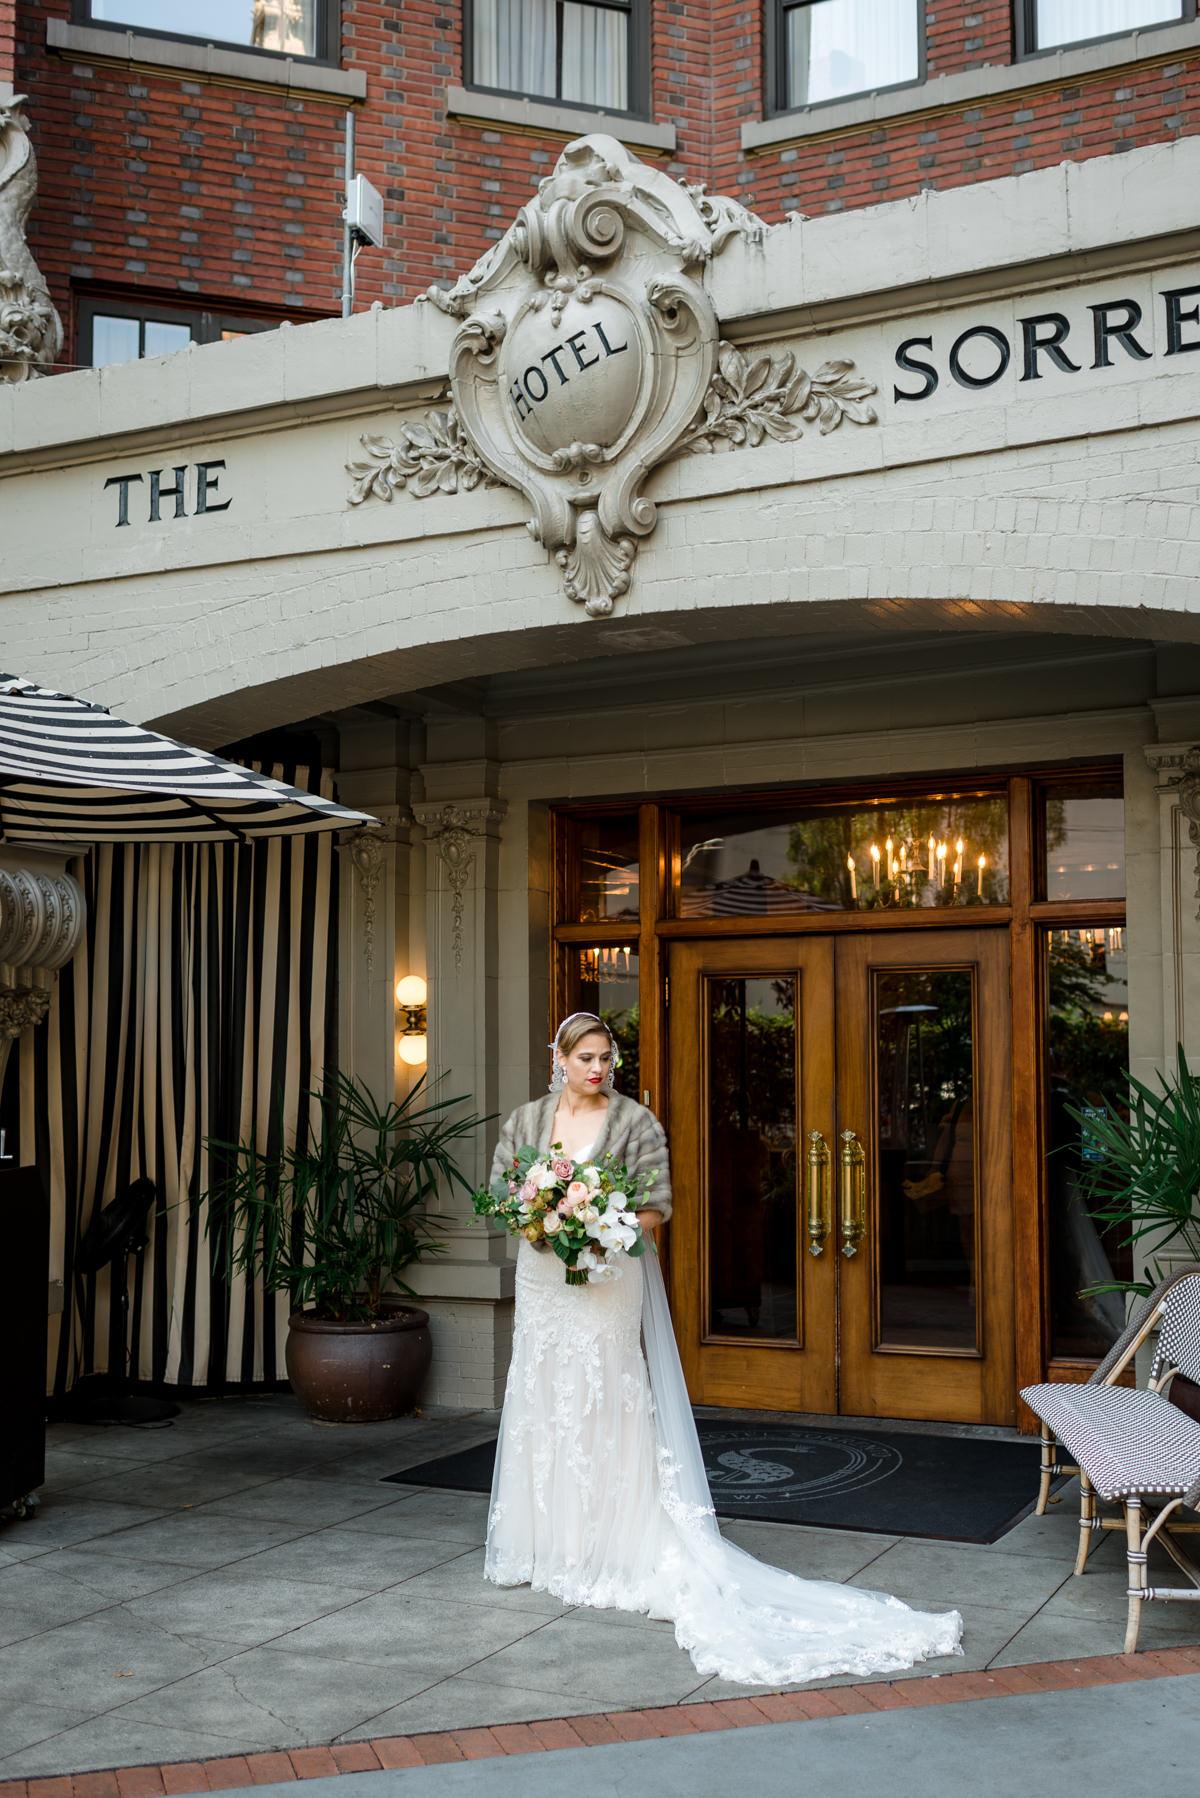 Andrew Tat - Documentary Wedding Photography - Hotel Sorrento - Seattle, Washington -Jessica & Paul - 14.jpg